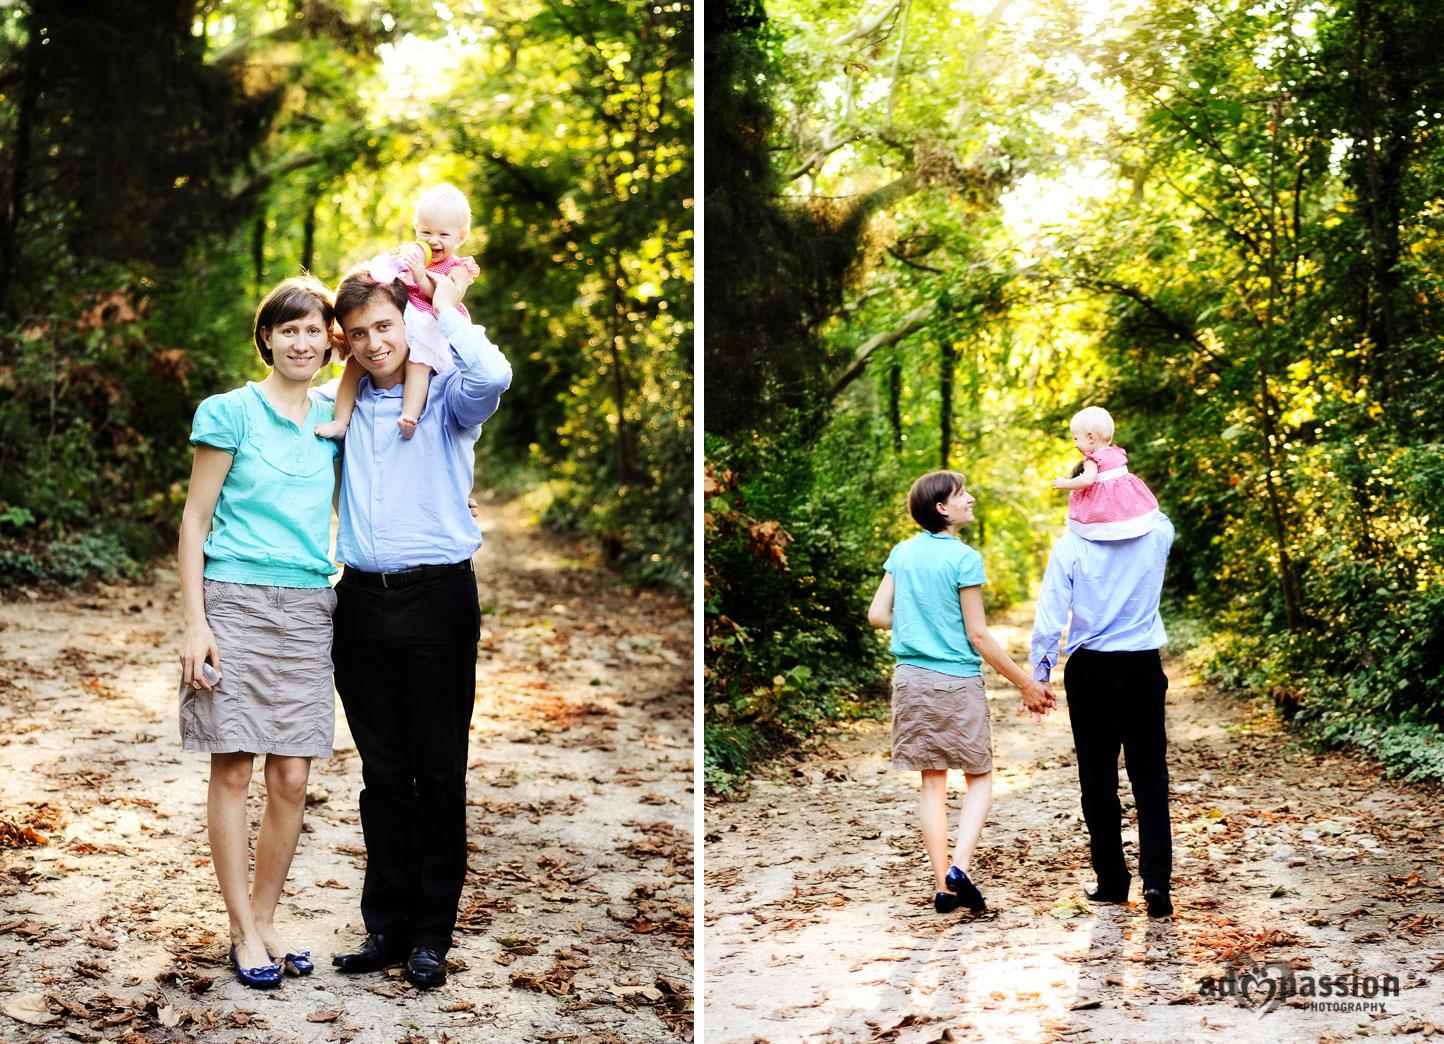 AD Passion Photography | maya-9 | Adelin, Dida, fotograf profesionist, fotograf de nunta, fotografie de nunta, fotograf Timisoara, fotograf Craiova, fotograf Bucuresti, fotograf Arad, nunta Timisoara, nunta Arad, nunta Bucuresti, nunta Craiova